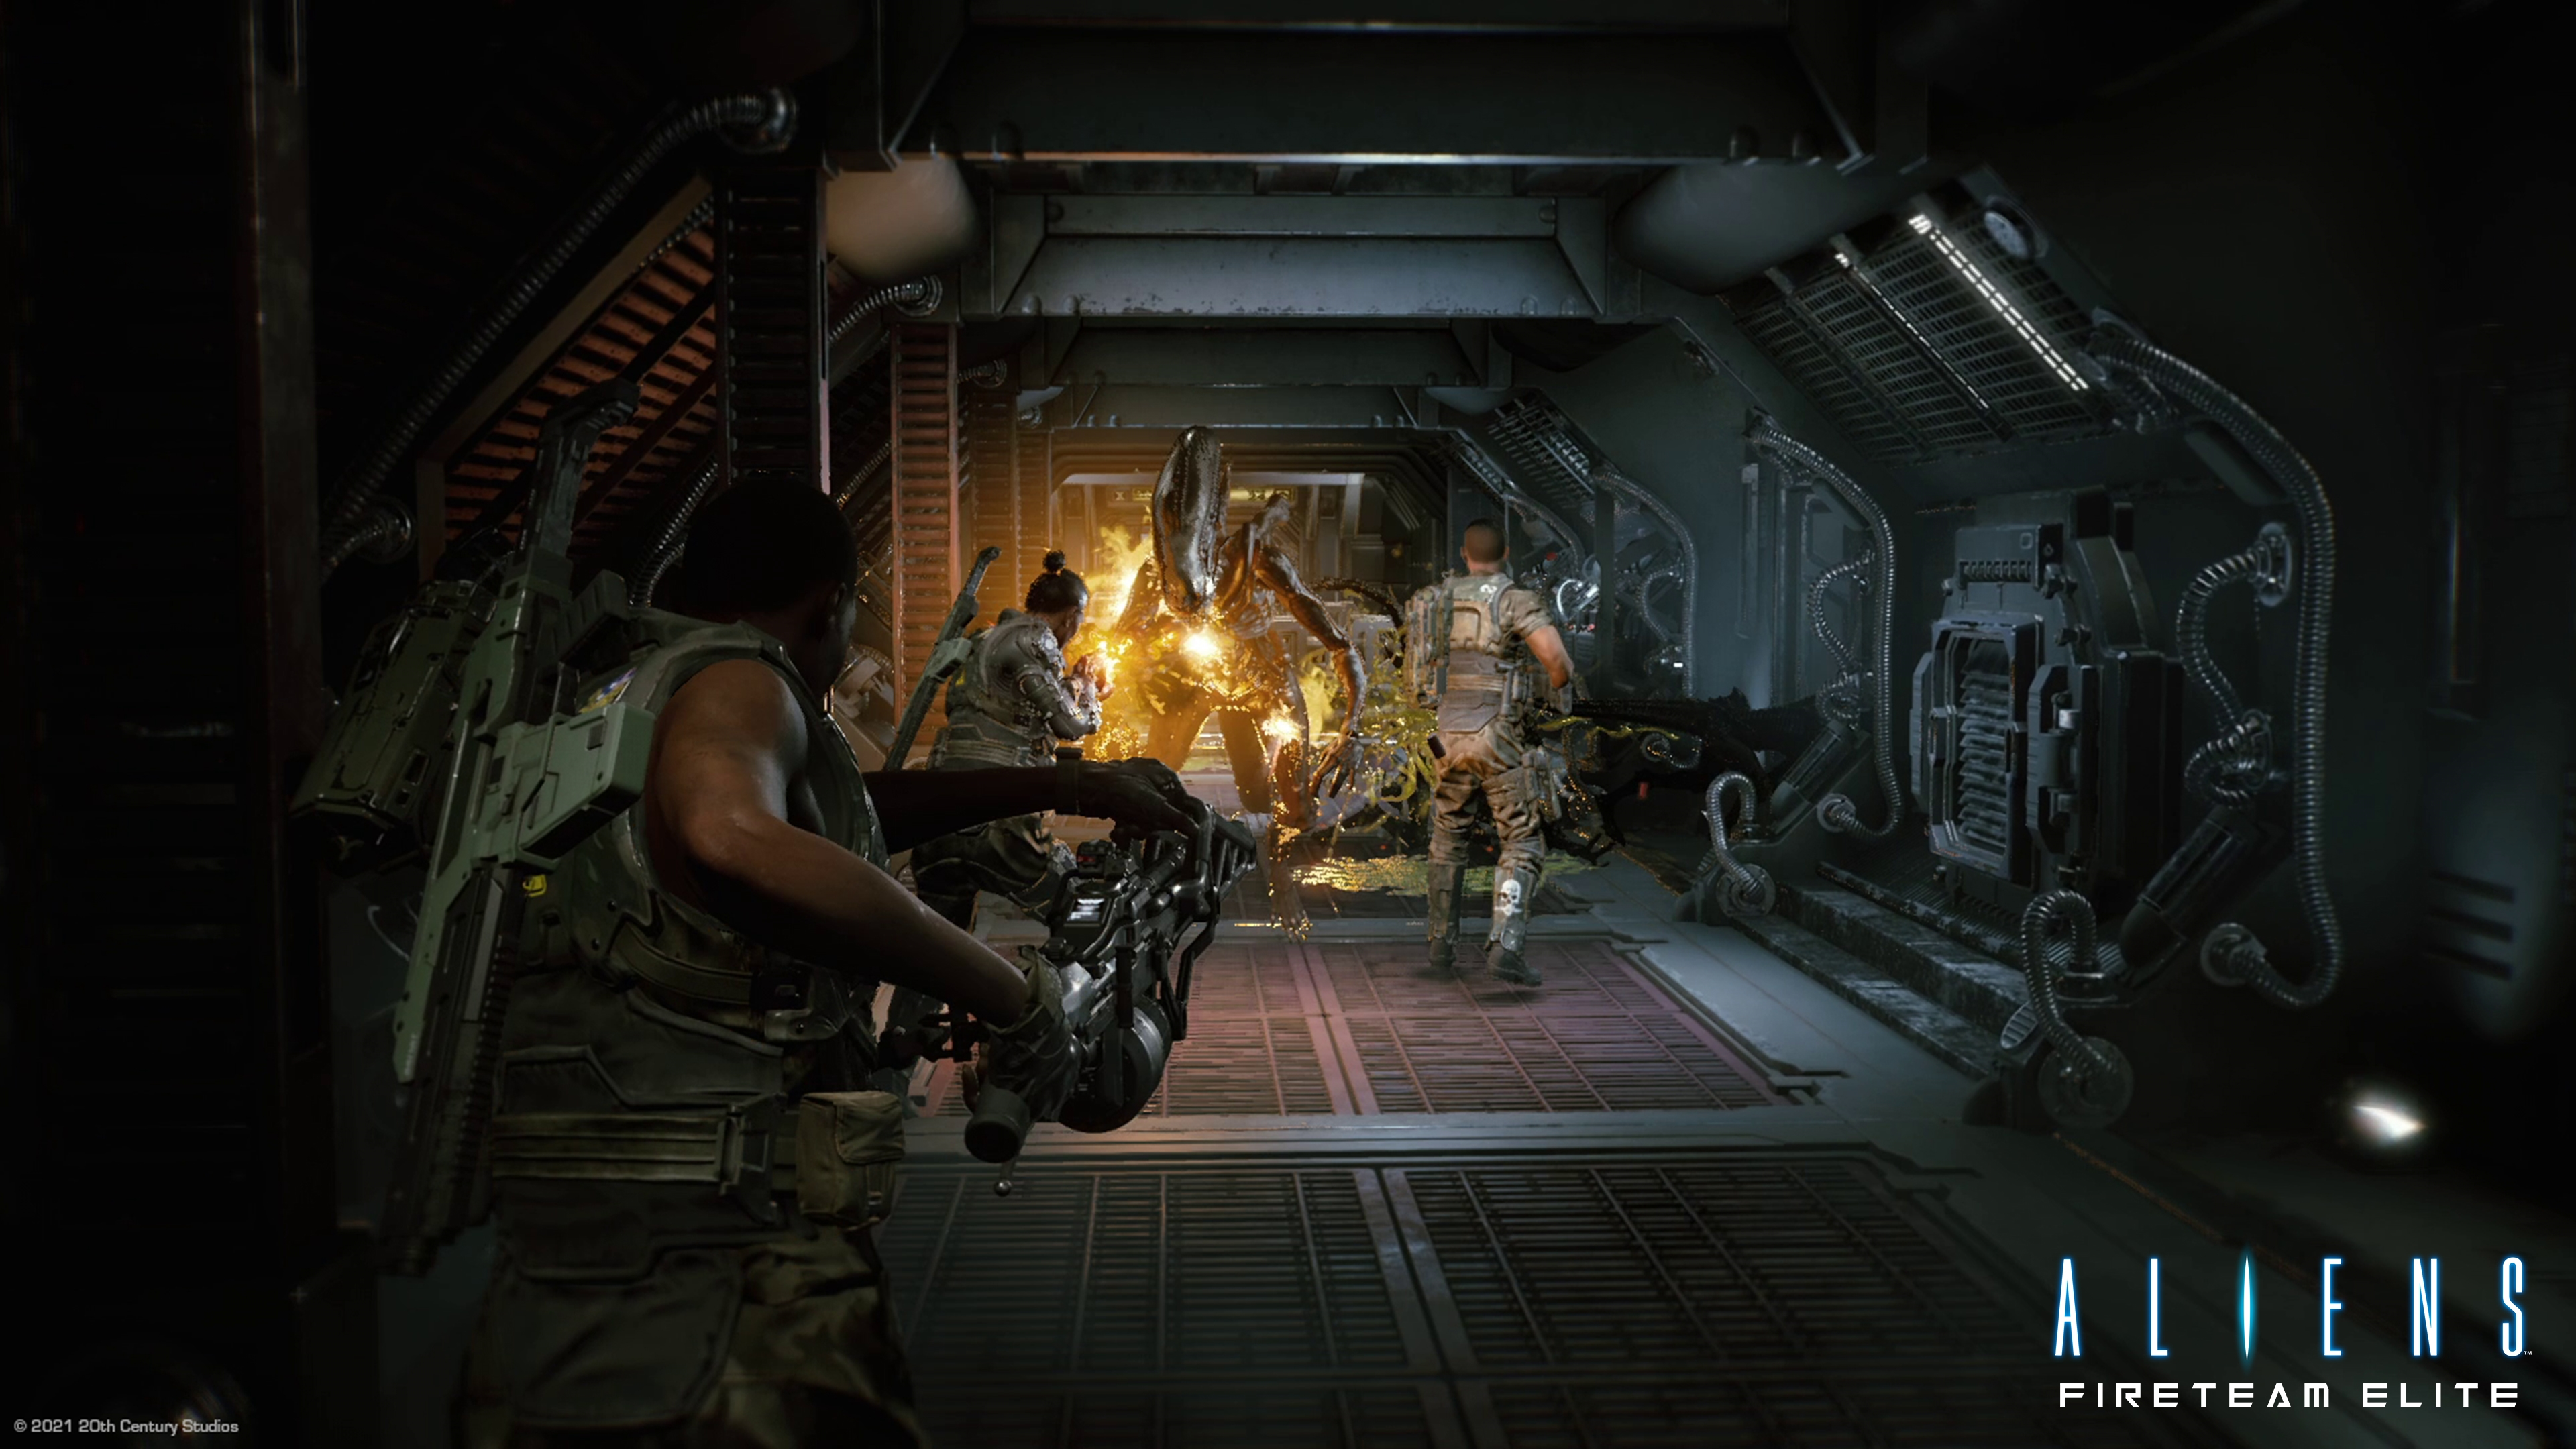 Aliens: Fireteam Elite | APAC (26e0a01c-398d-4c64-bf7d-f214e06ebcde)